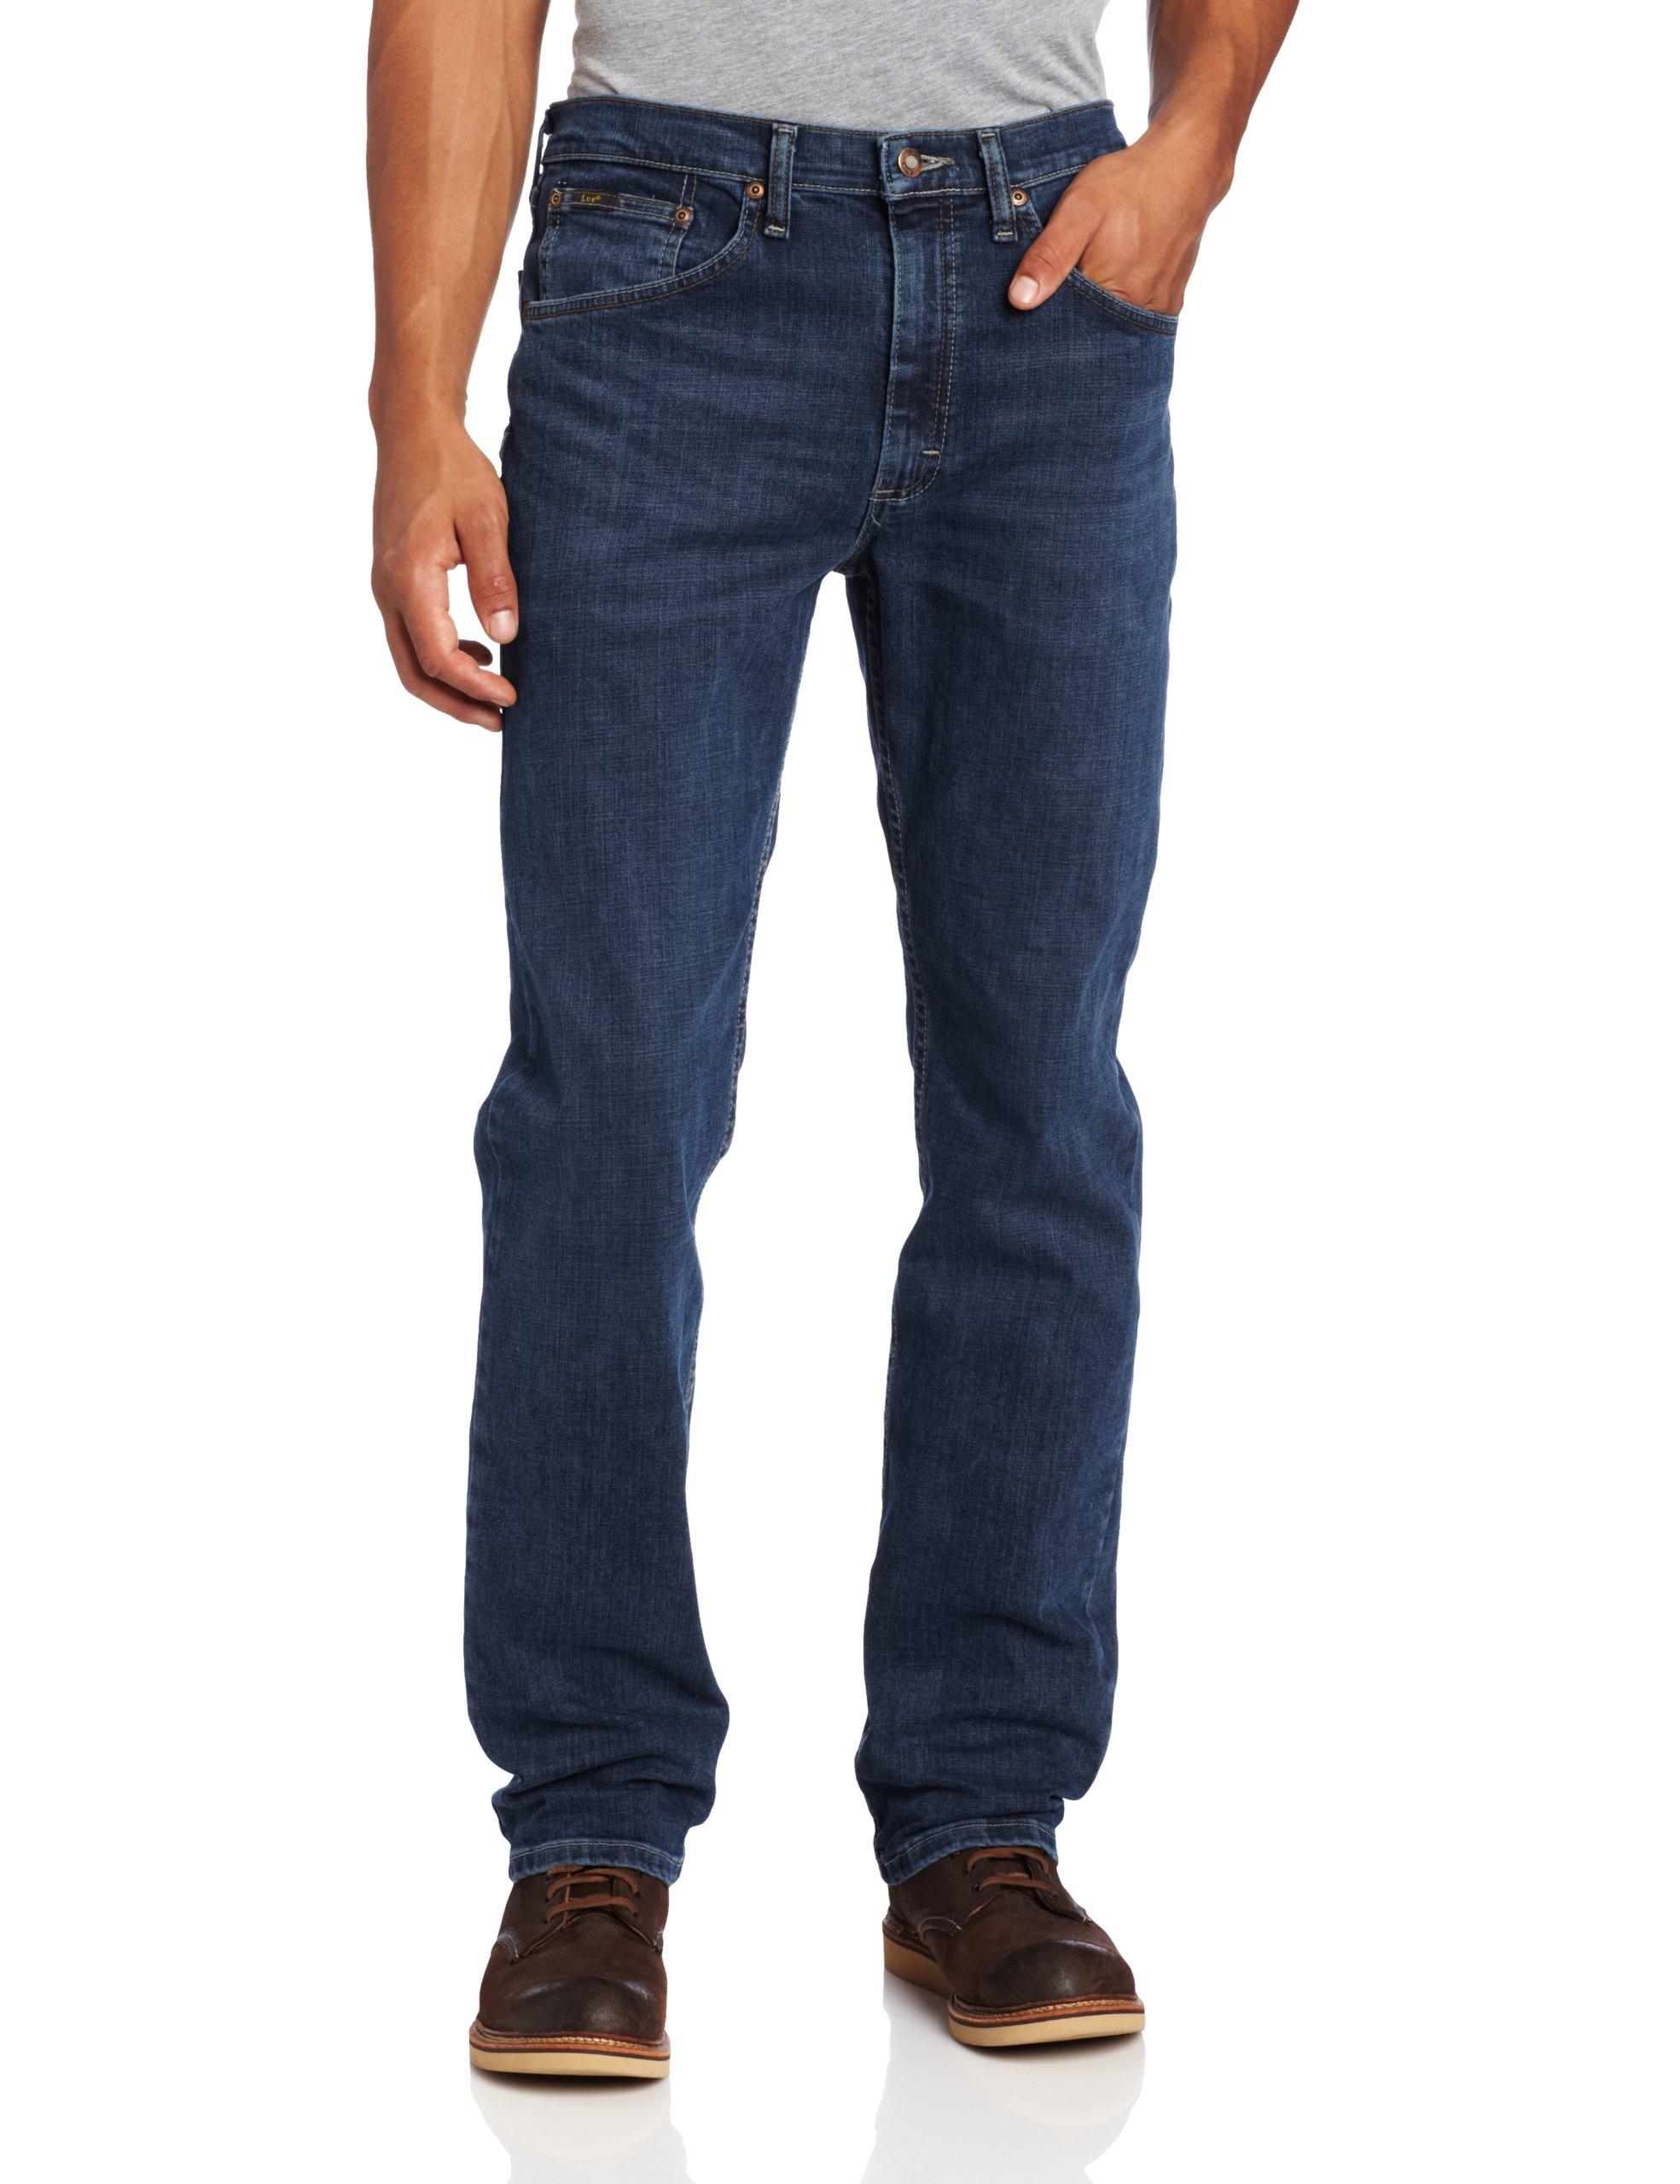 LEE Men's Premium Select Classic Fit Straight Leg Jean, Boss, 32W x 30L